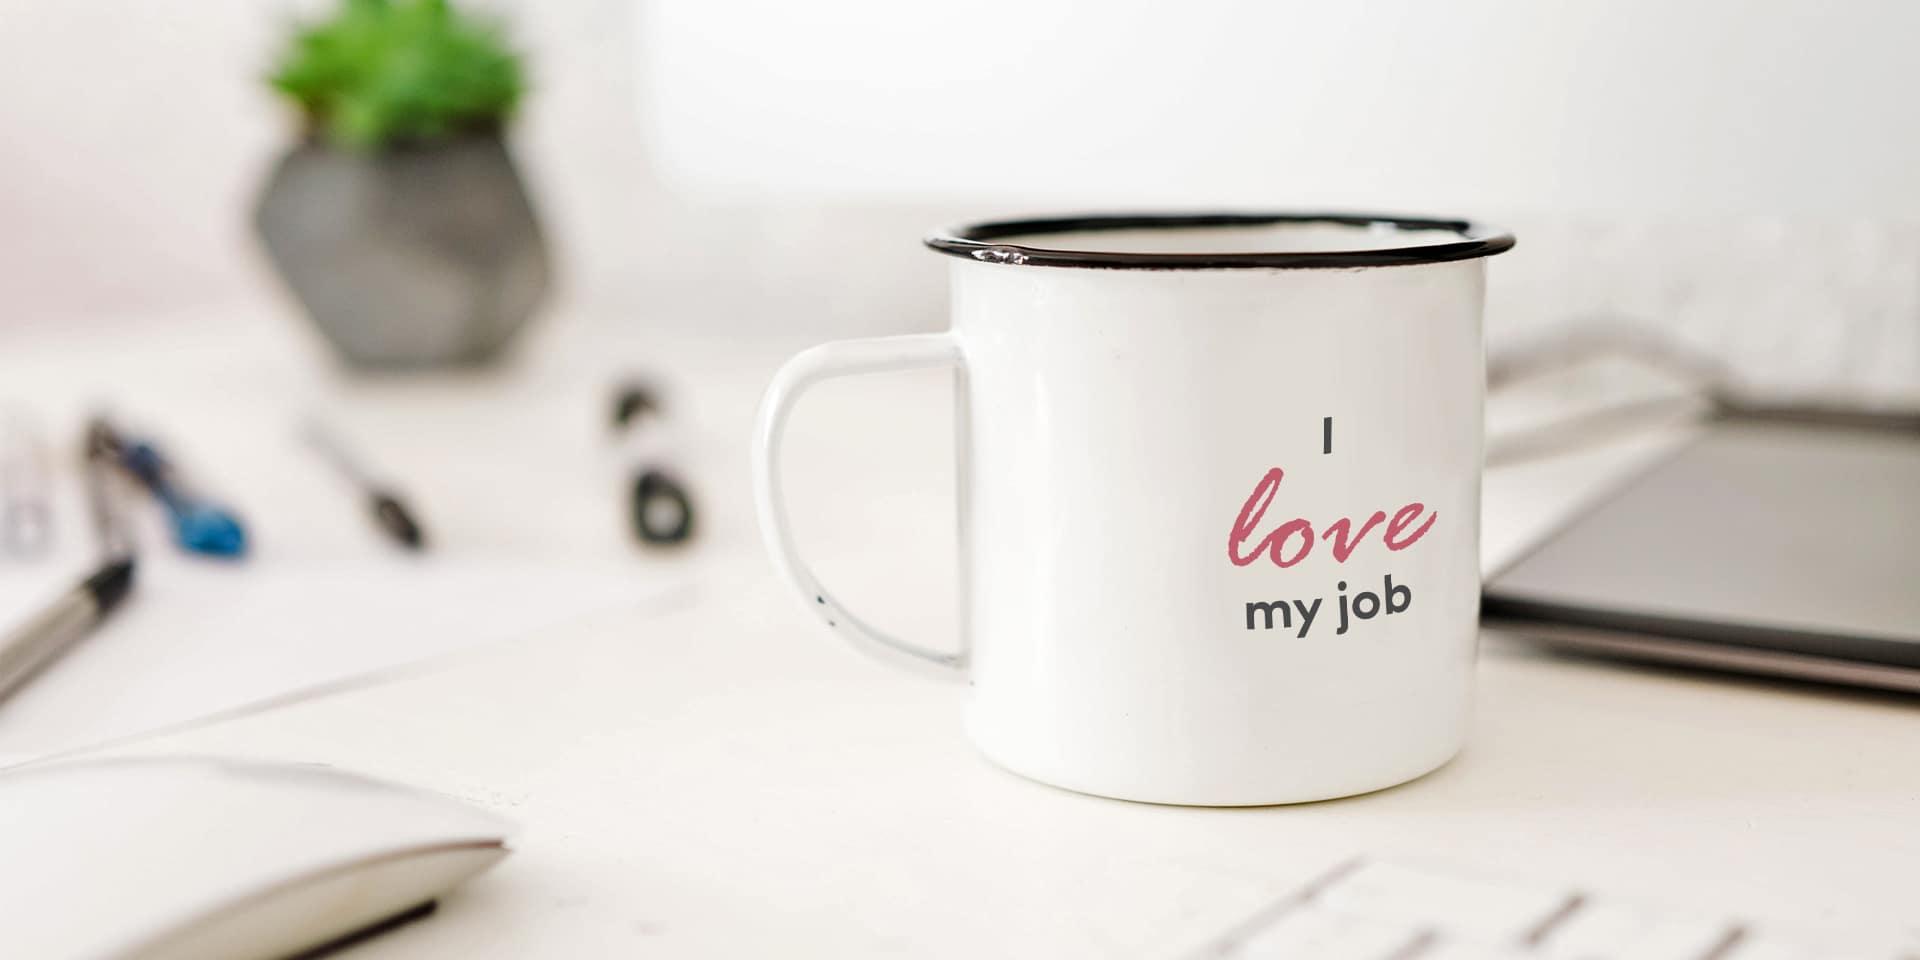 Employee enagagement